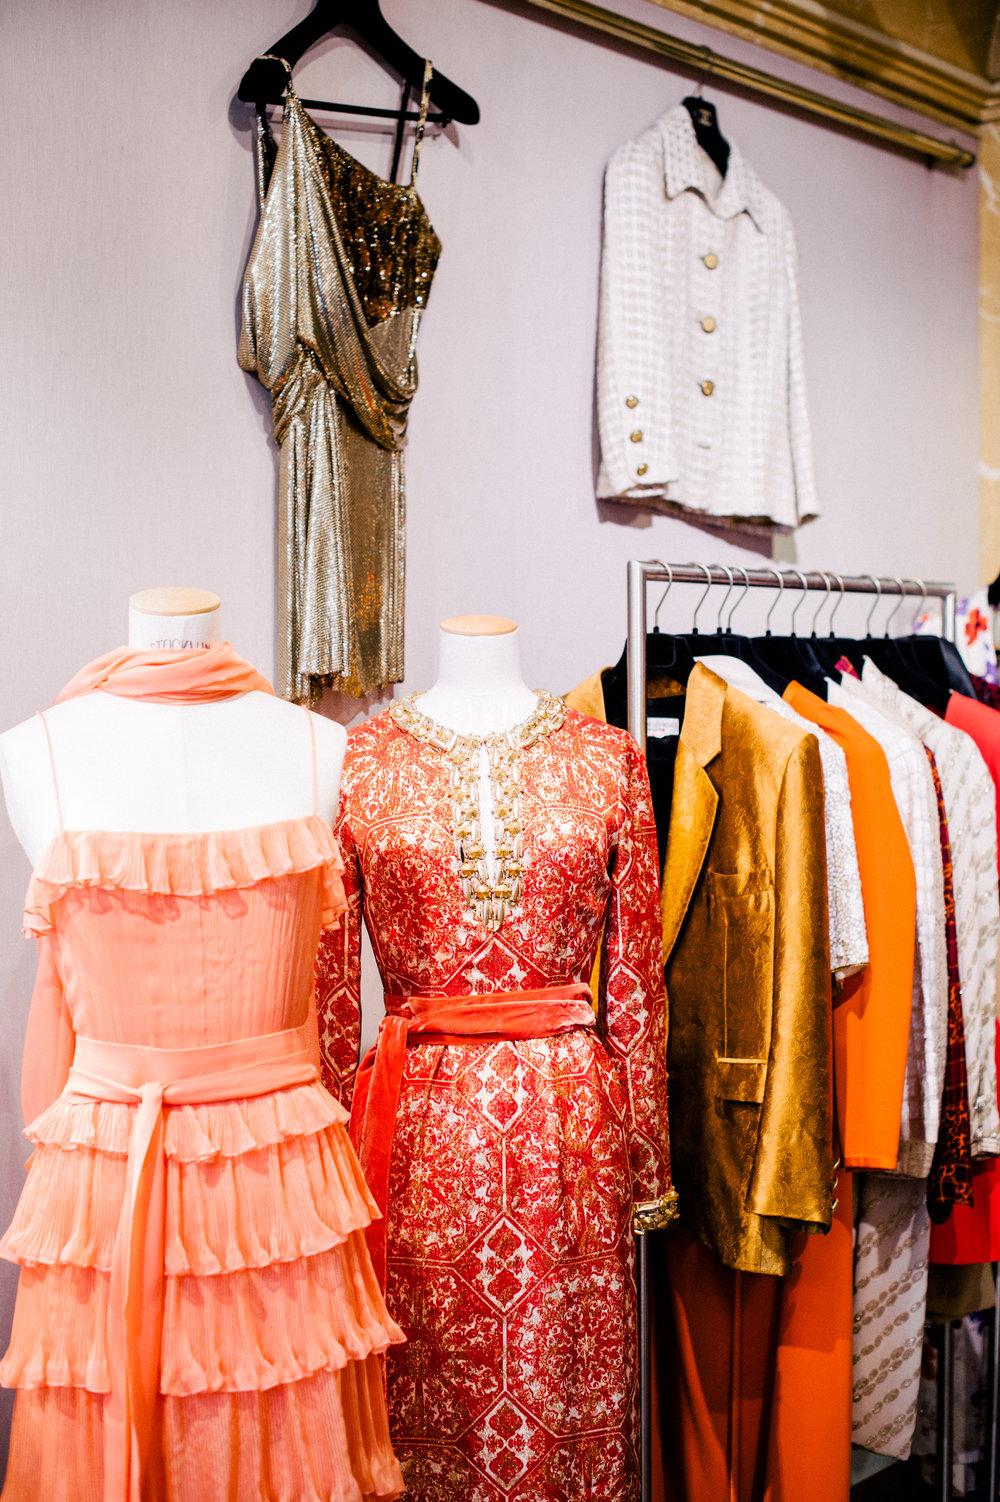 An assortment of designer dresses and jackets